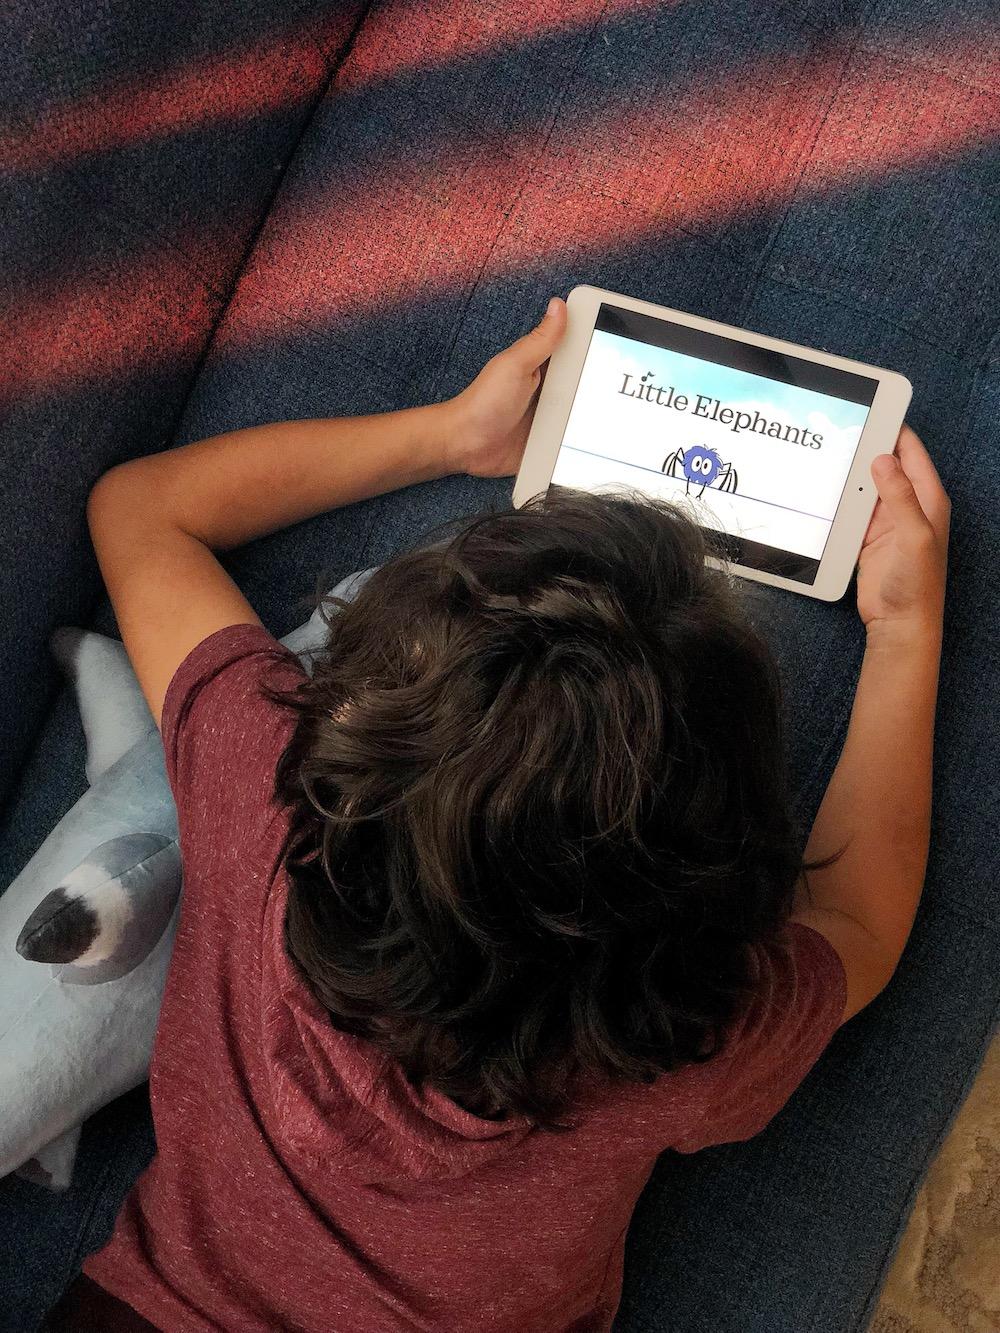 Learn spanish nursery rhymes with Canticos with Nick Jr. | livingmividaloca.com | #livingmividaloca #canticos #spanishnurseryrhymes #spanishrhymes #nurseryrhymes